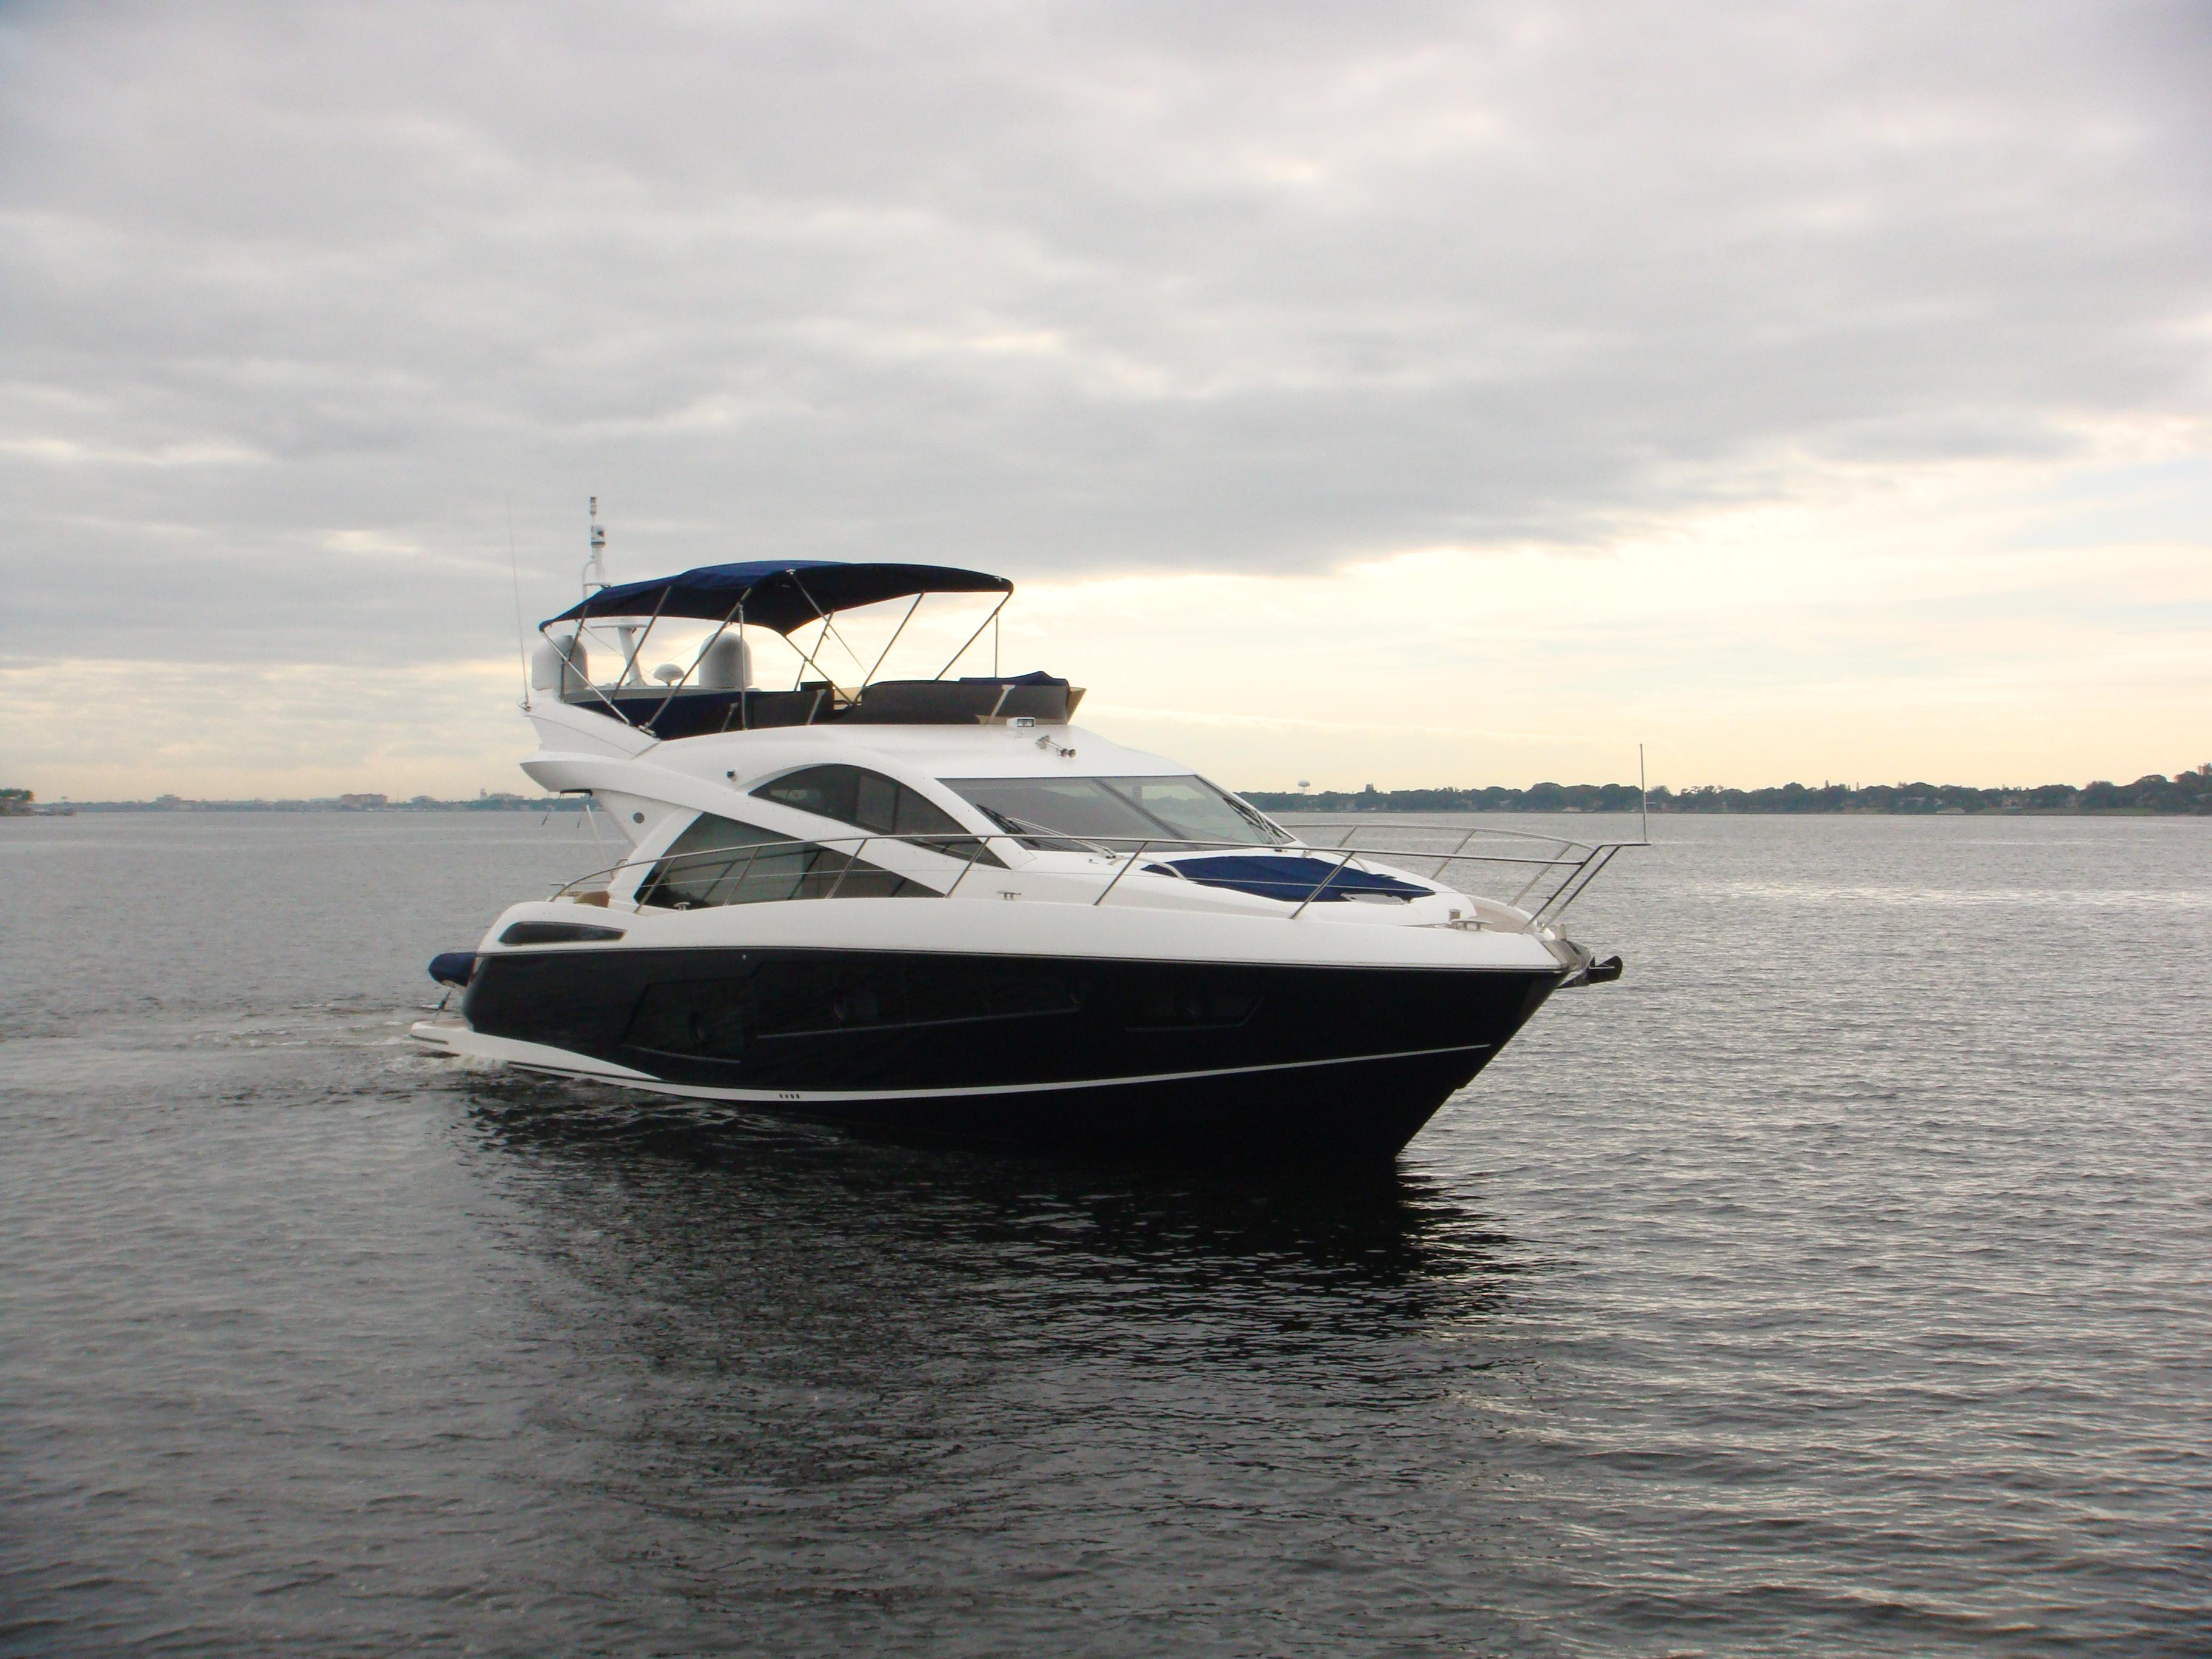 2014 Sunseeker 60 Manhattan Yacht For Sale | BG | SI Yachts